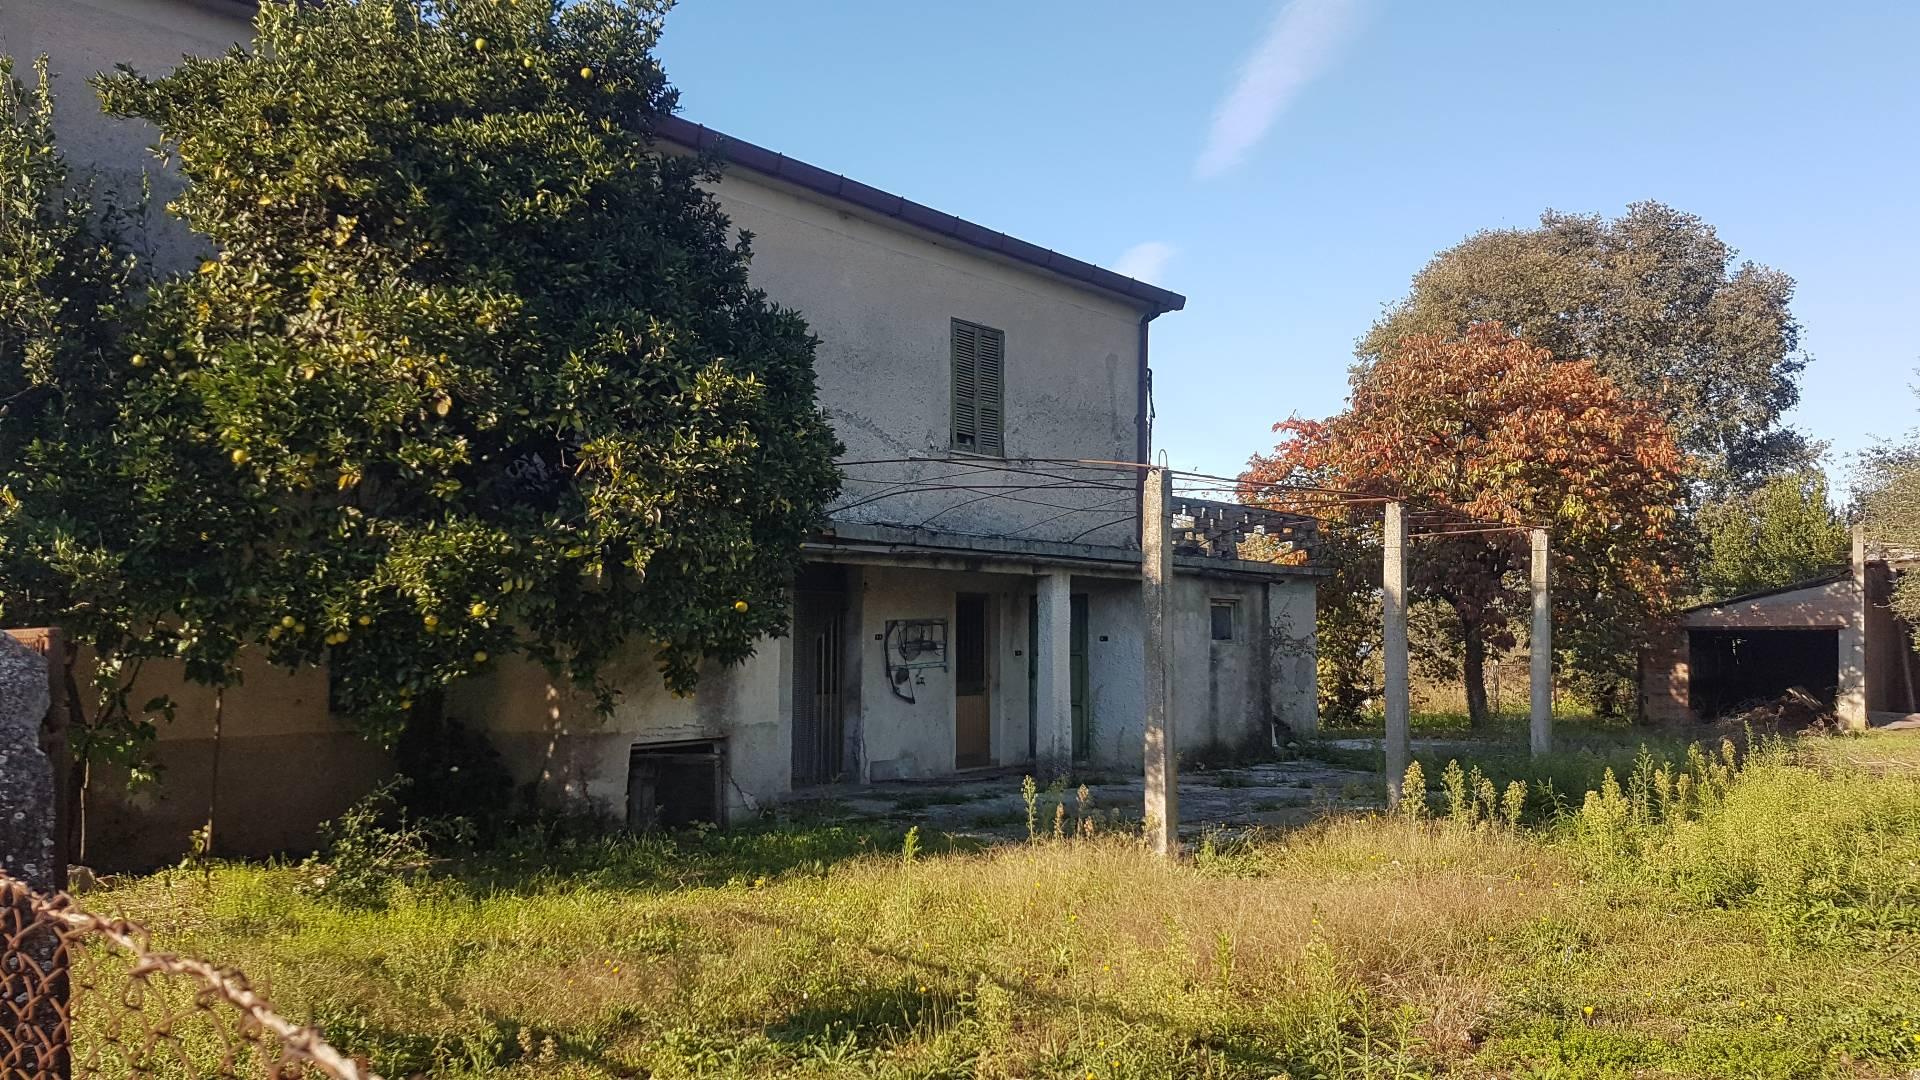 Casale di campagna in vendita a roccasecca cod ac99 175 - Ristrutturare casale di campagna ...